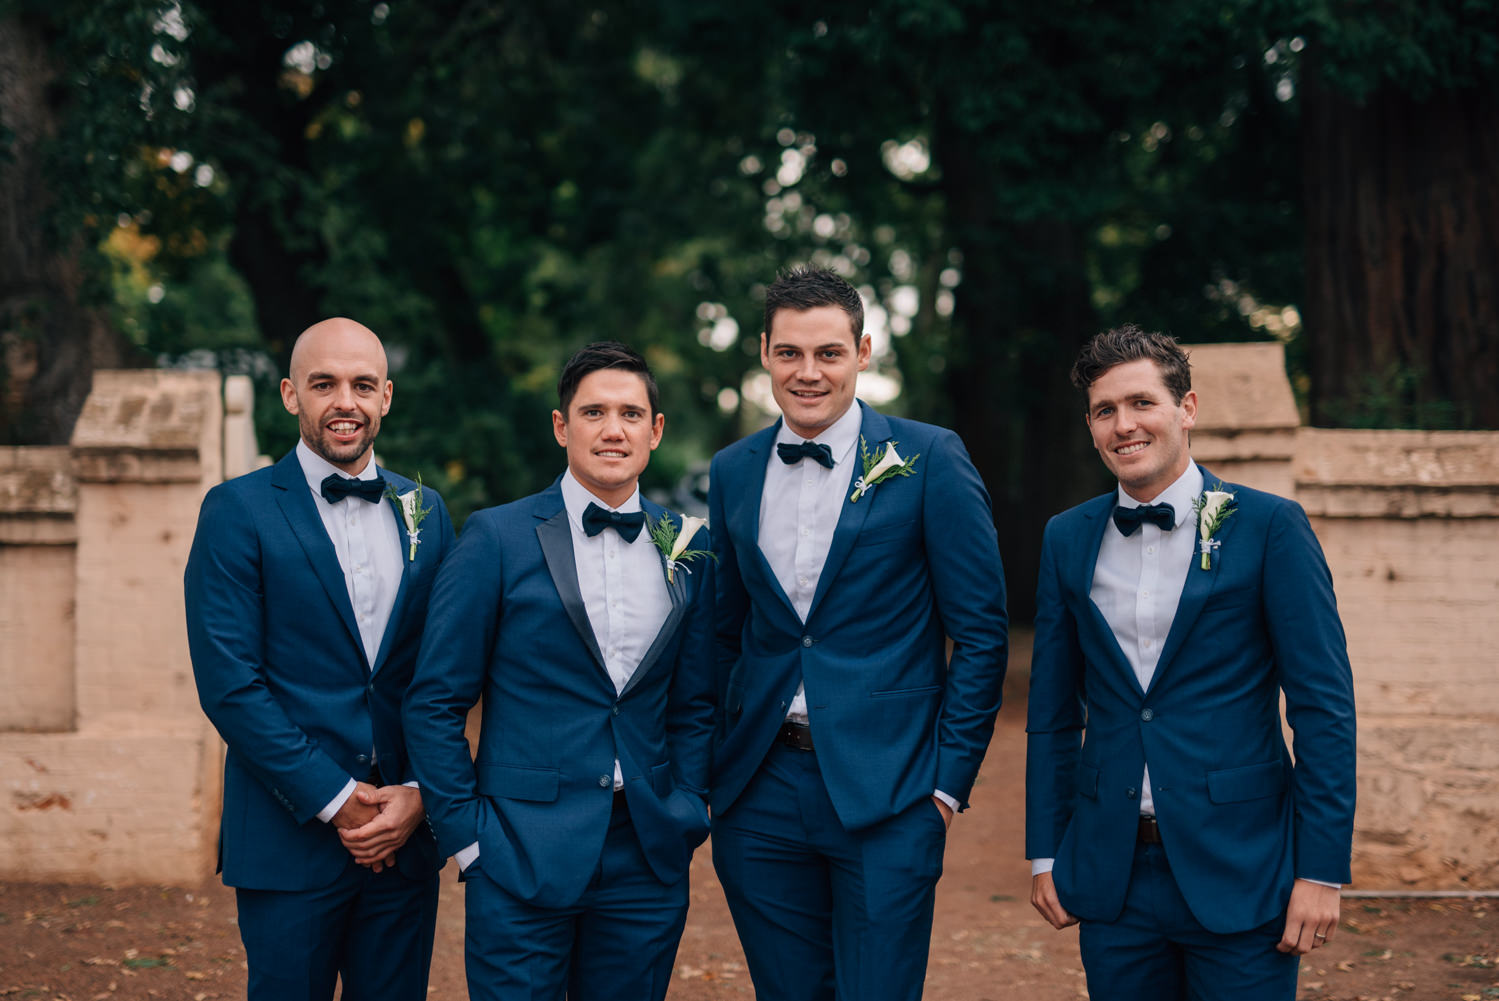 Entally-House-Wedding-Photographer-65.jpg